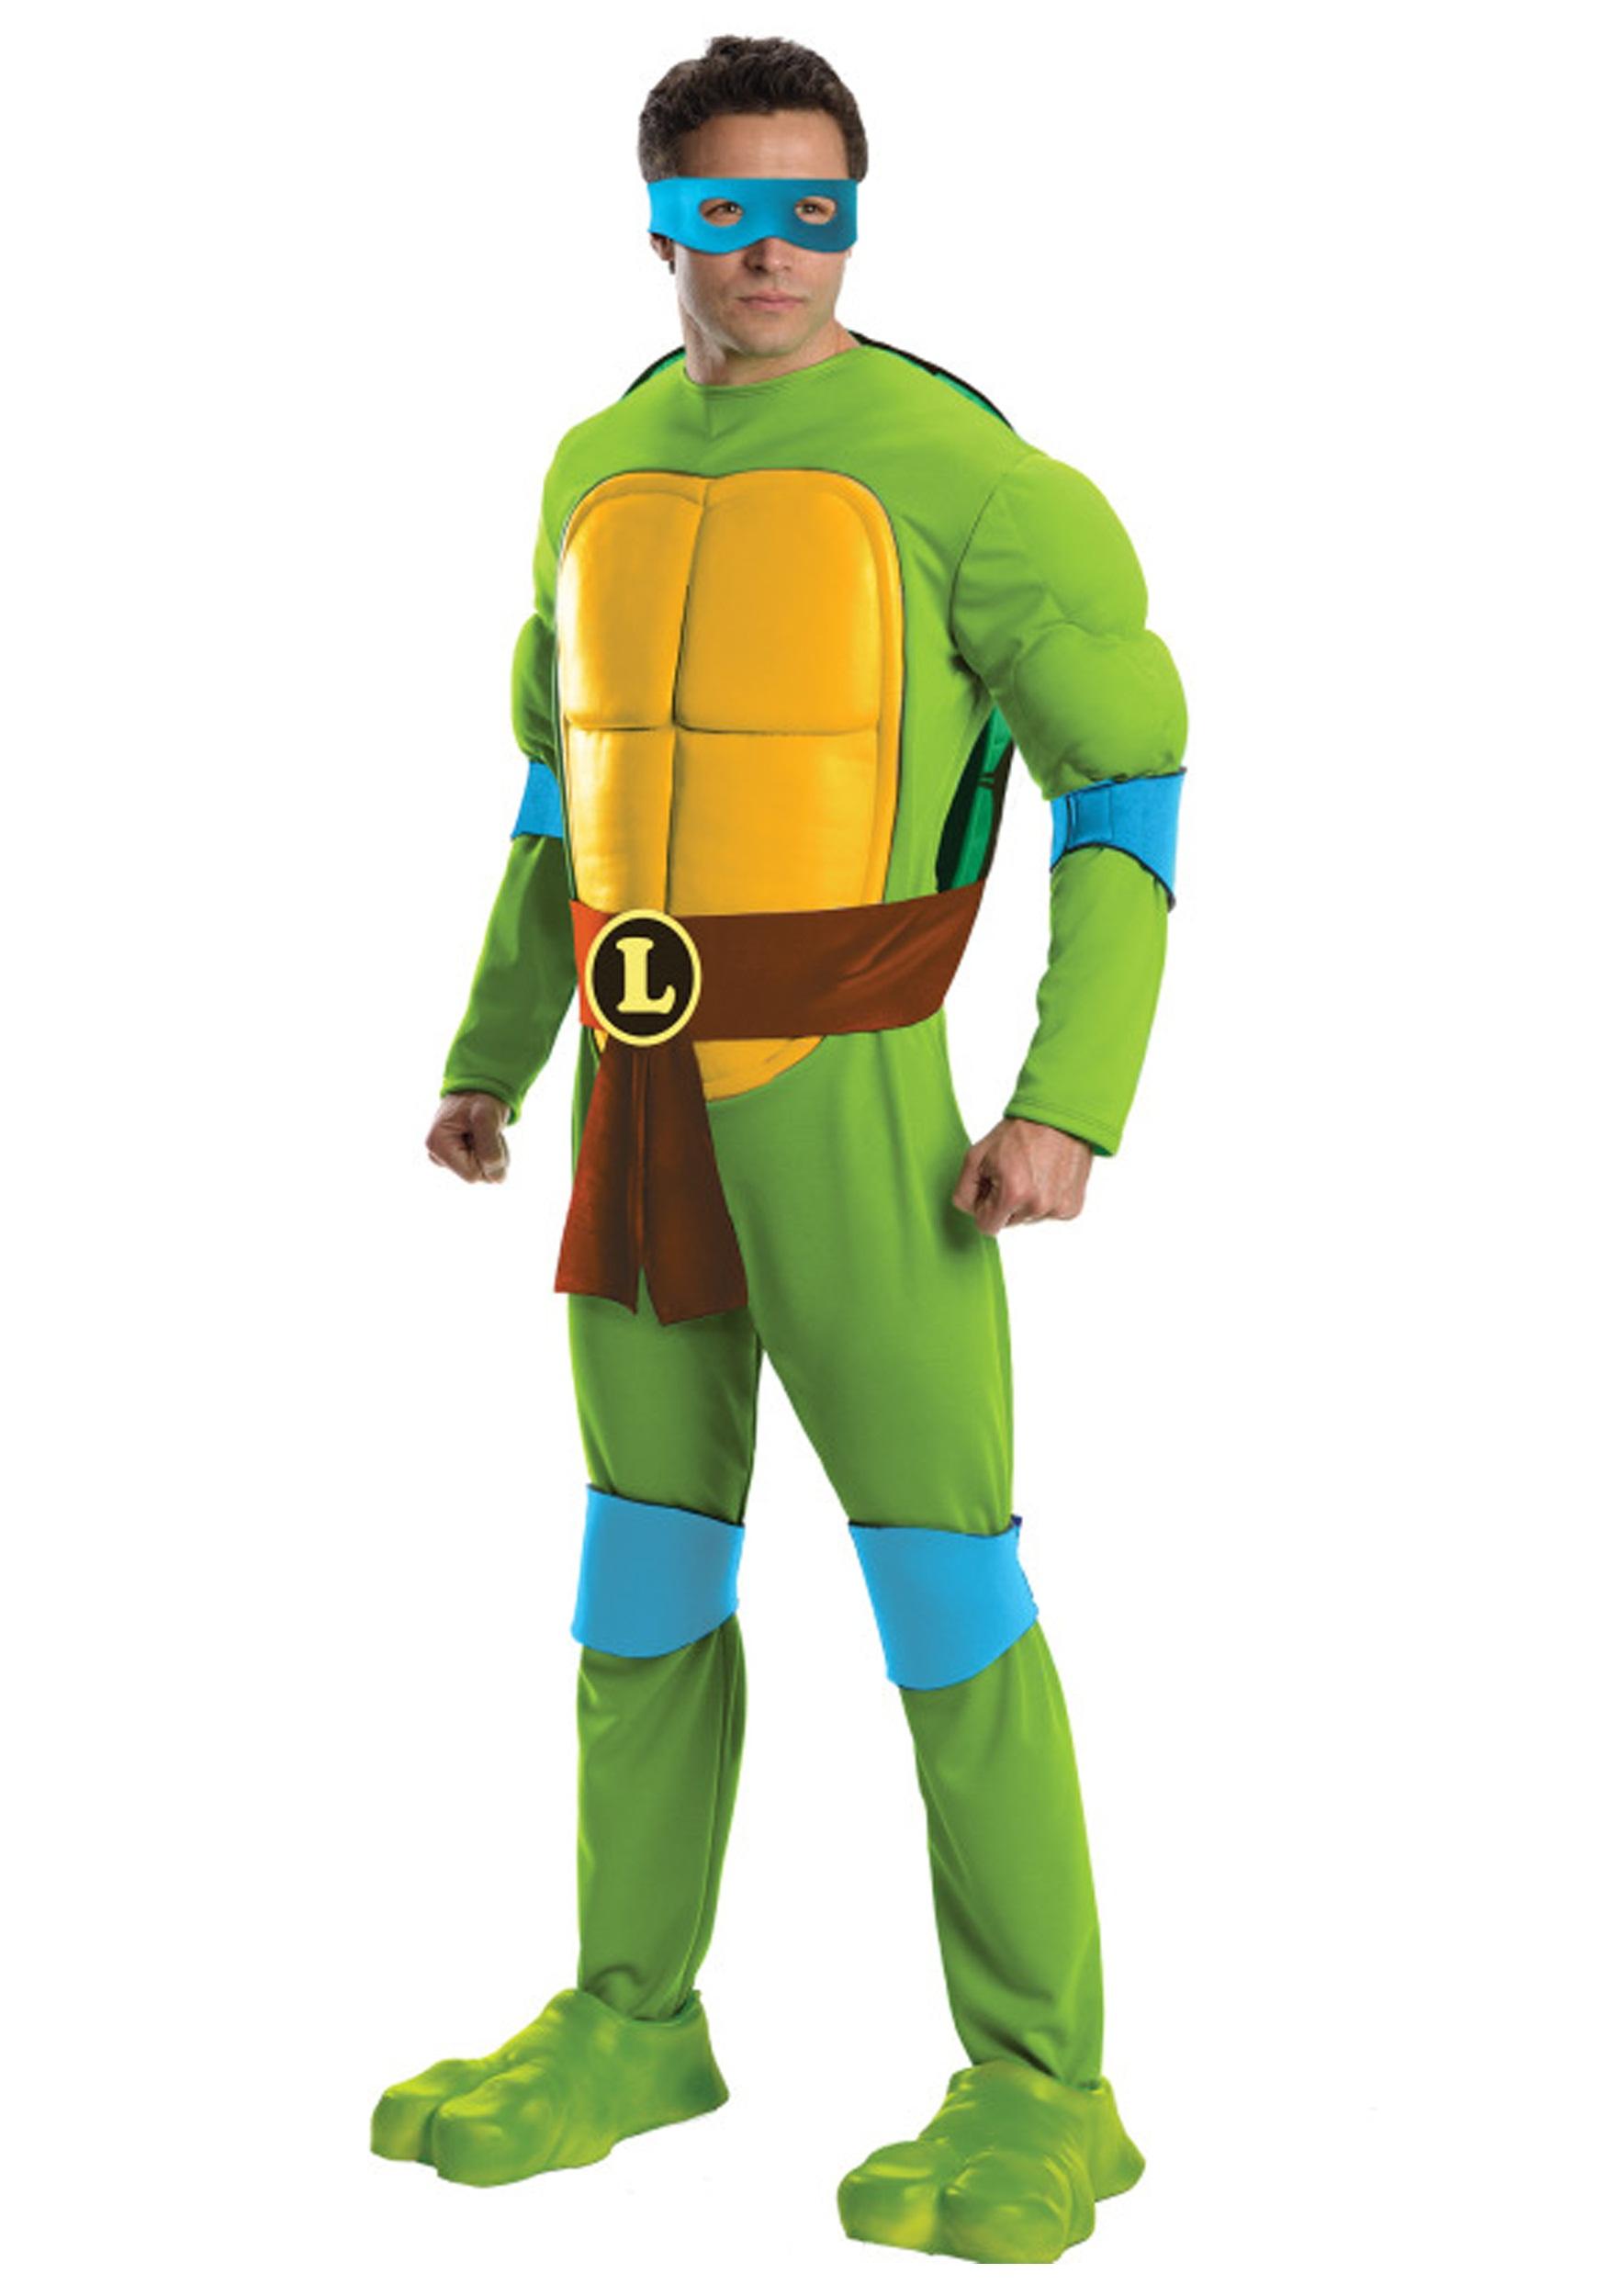 Deluxe tmnt leonardo costume for men deluxe tmnt leonardo mens costume solutioingenieria Gallery